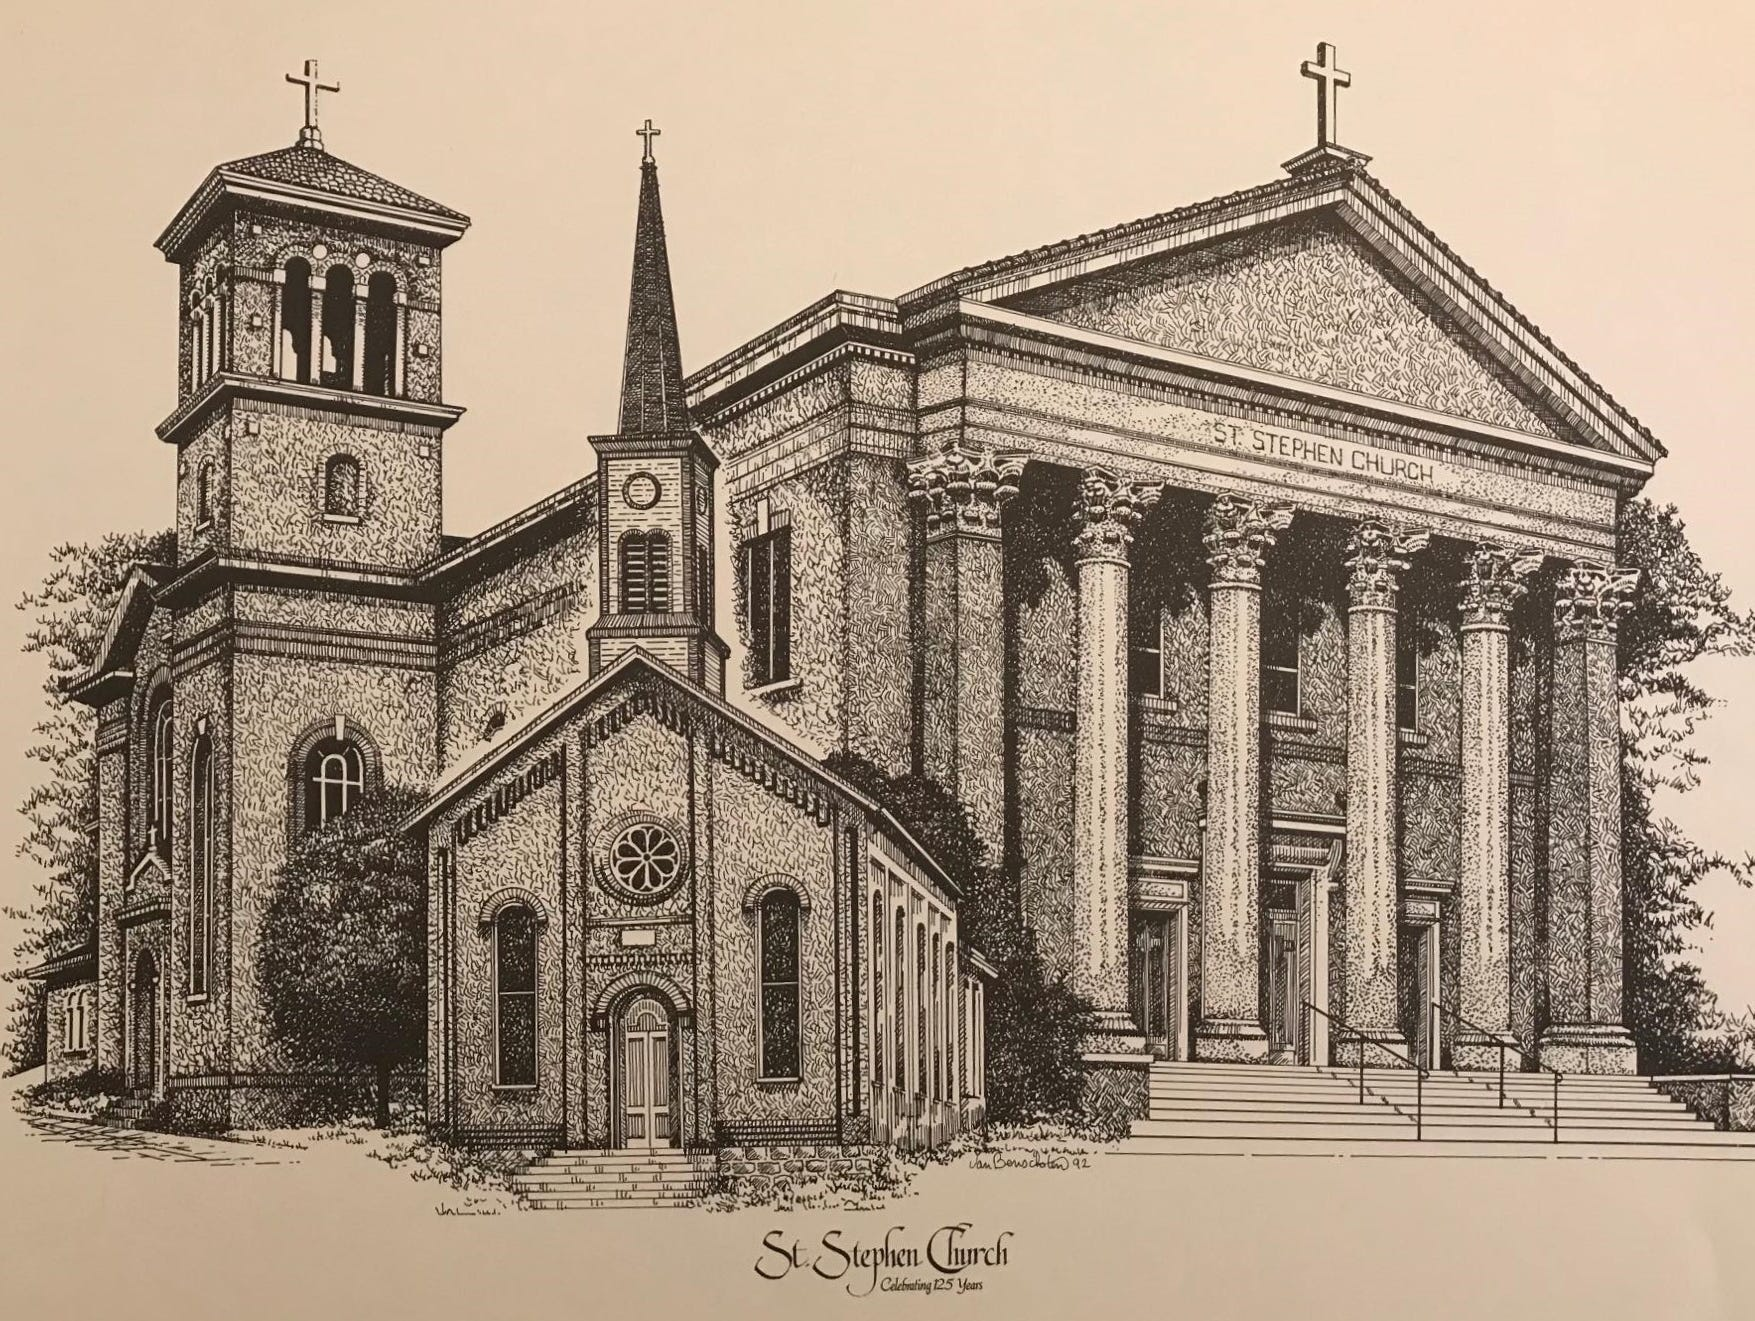 Thom Van Benschoten drew this print of St. Stephen Church, located between the East End and Pendleton in Cincinnati.